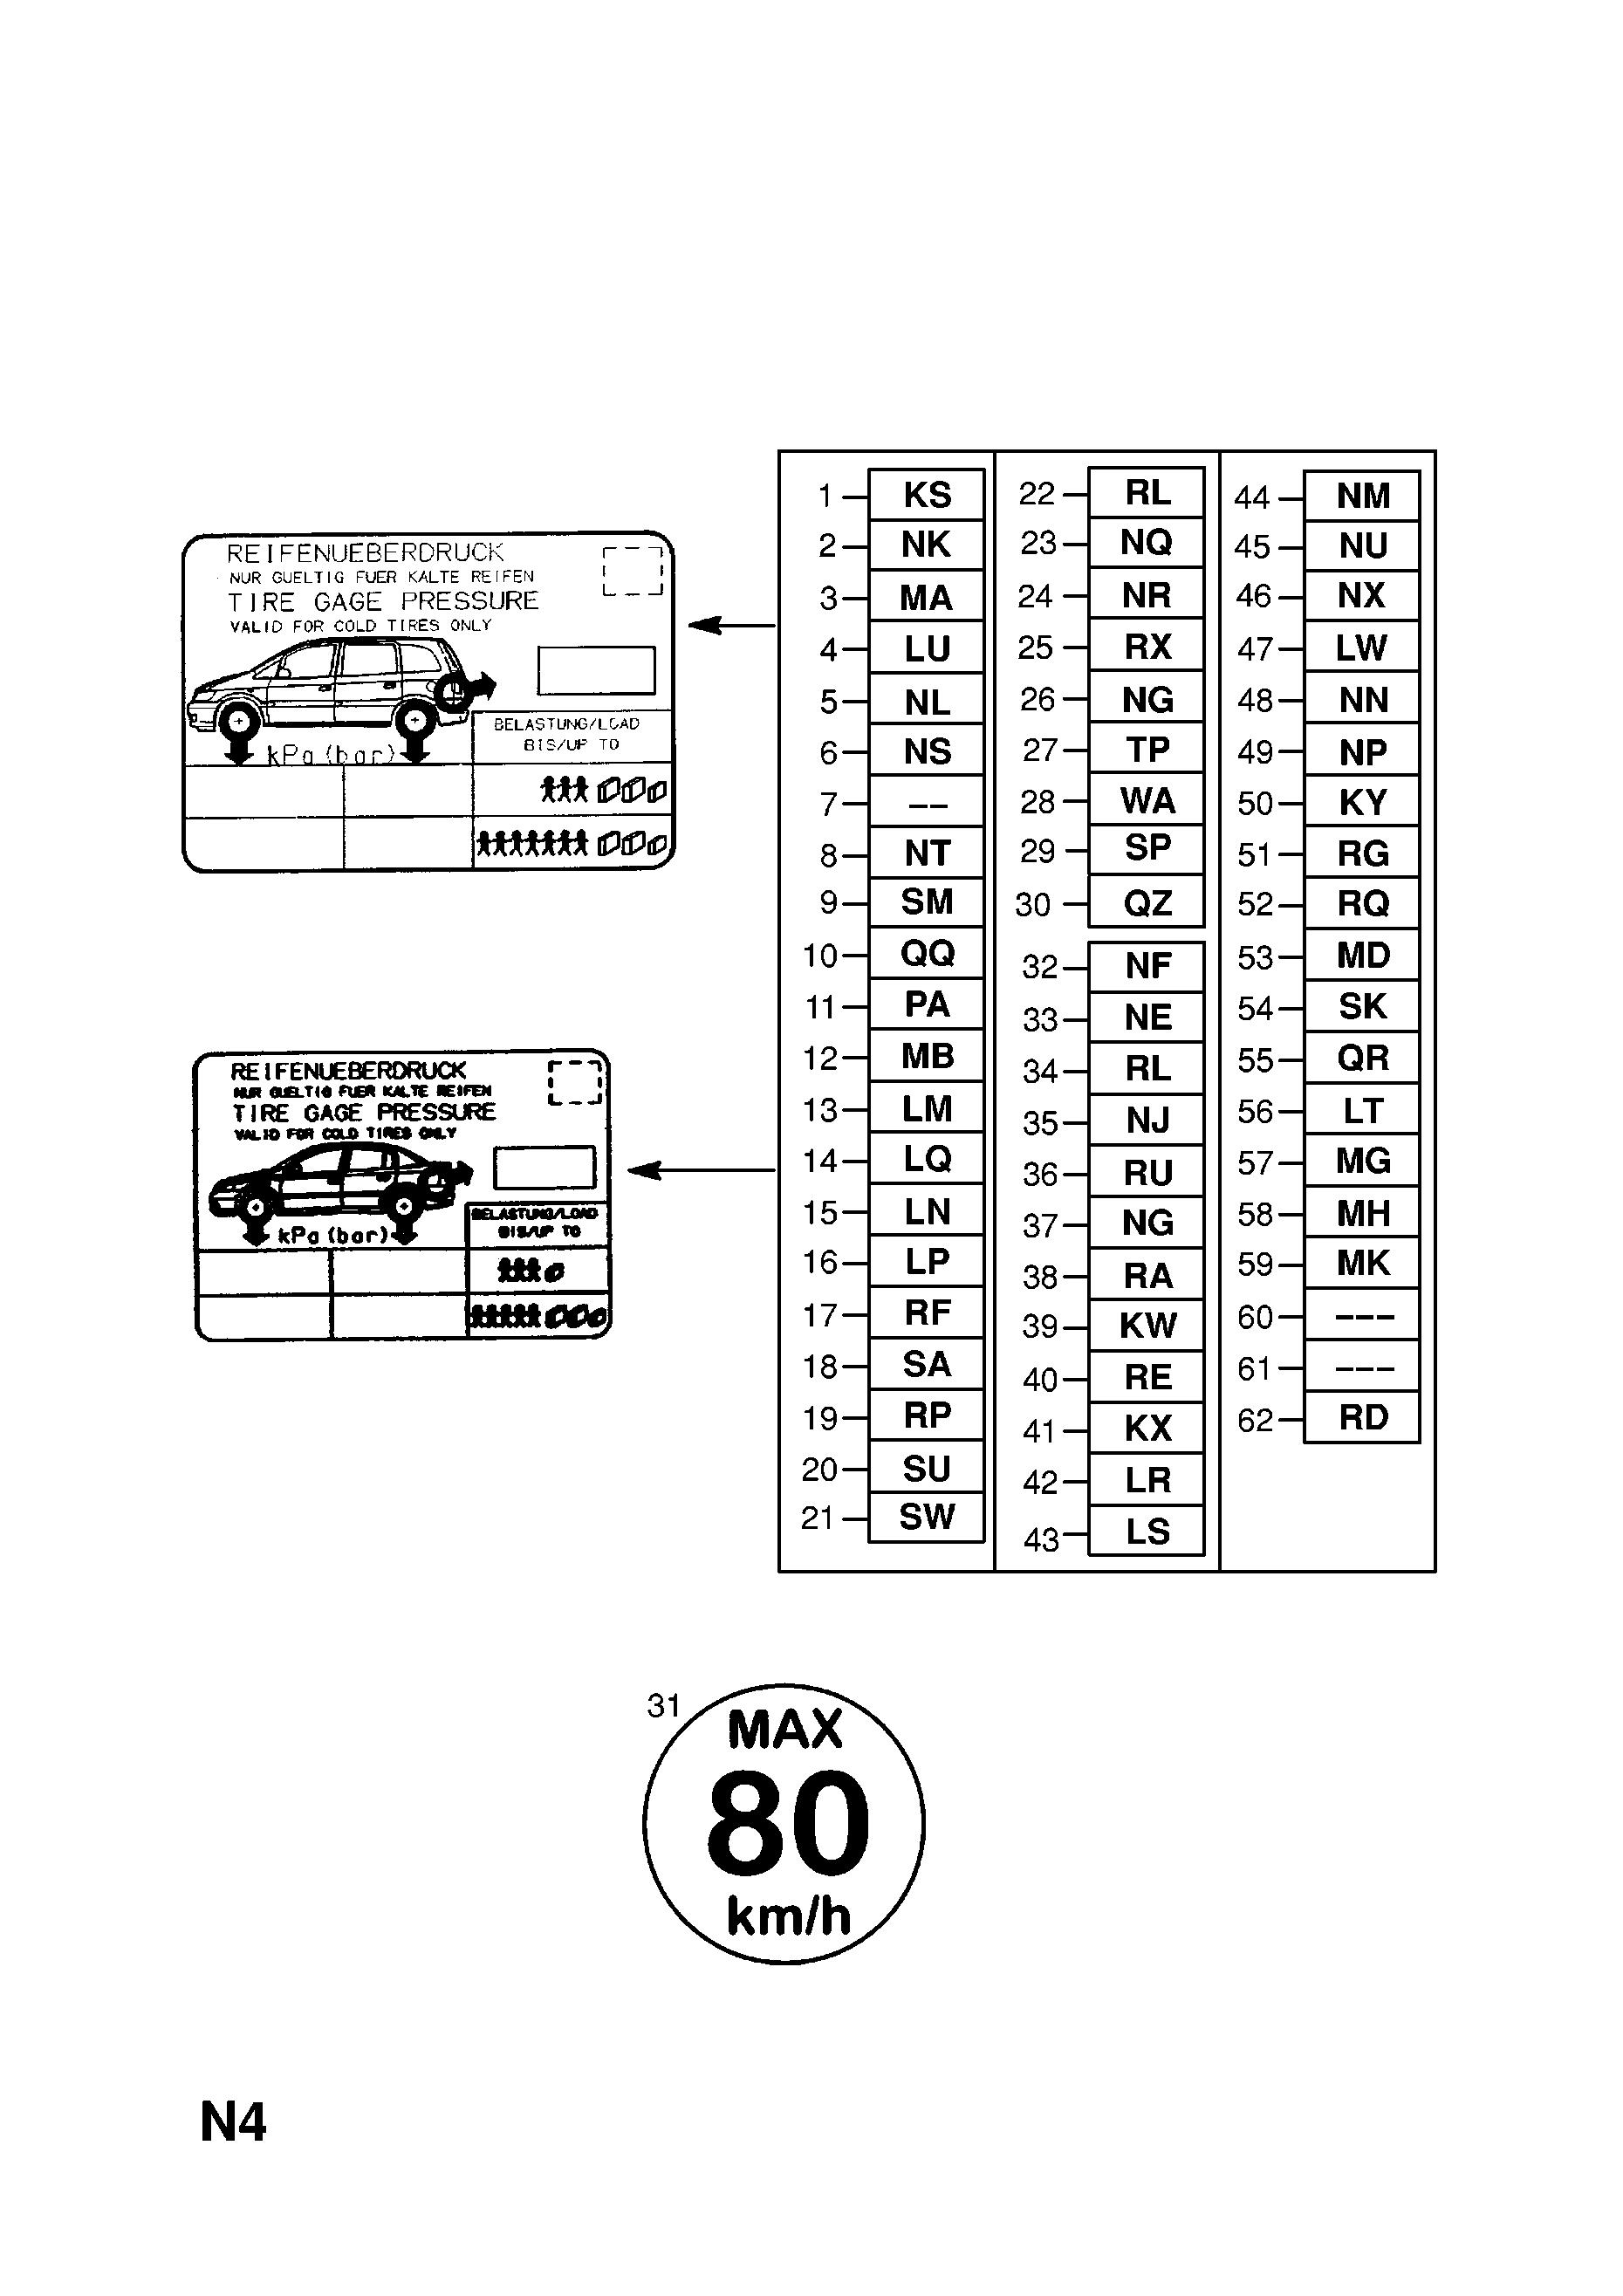 Image Result For Car Tyre Pressure Number